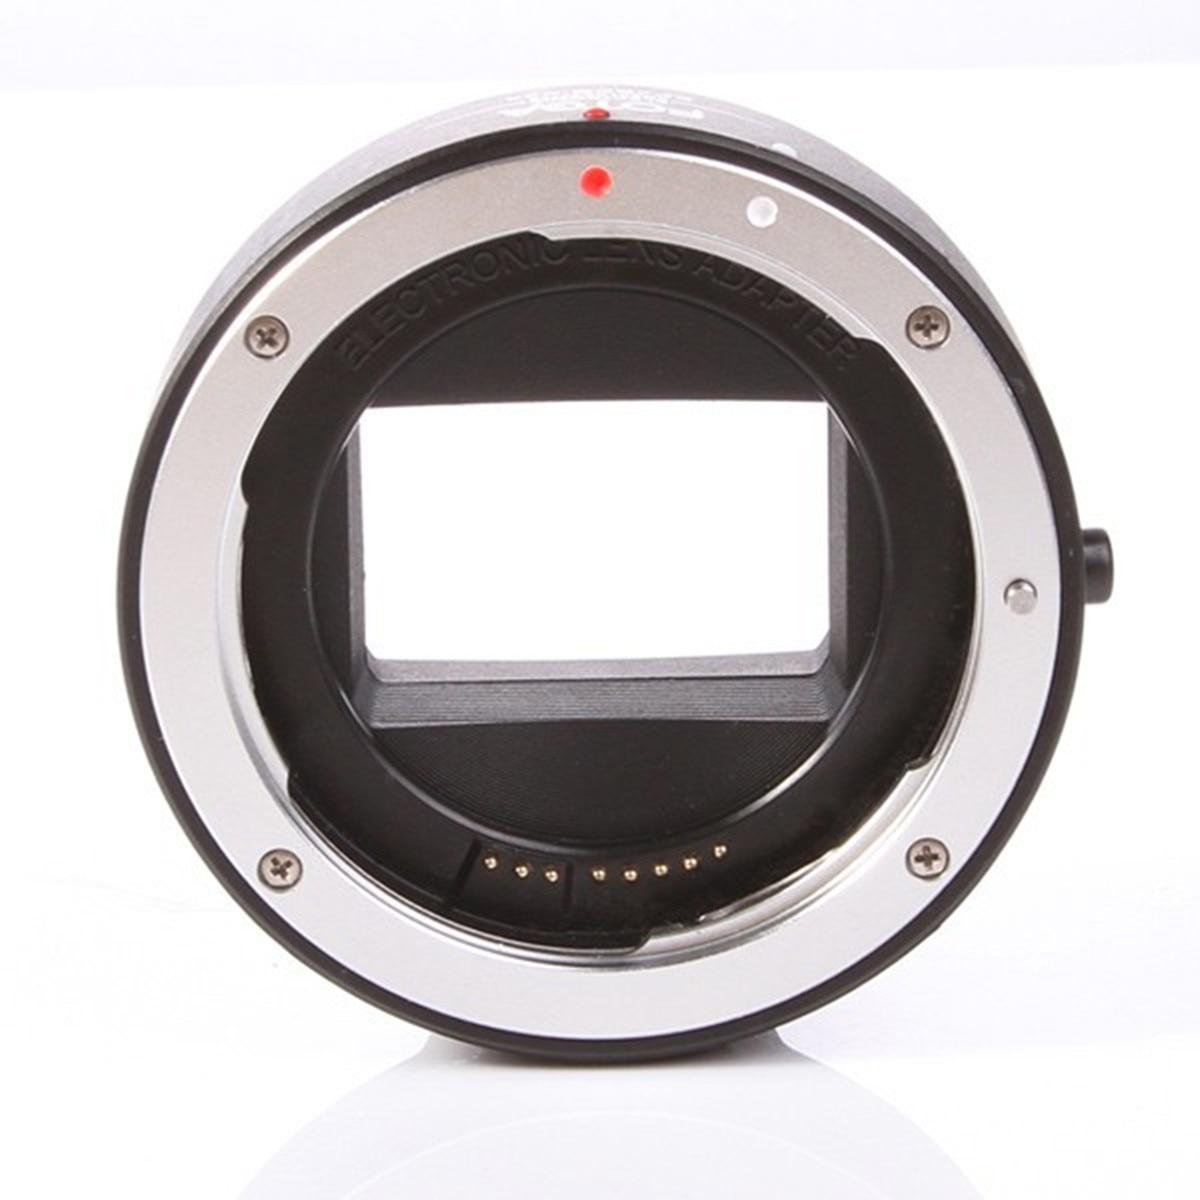 FOTGA Electronic AF Auto Focus Lens Adapter Ring for Canon EOS EF EF-S to Sony E NEX A7 A7R A7S A9 A6300 A6500 lens Full Frame fotga electronic af auto focus lens adapter for canon ef ef s to sony e nex a7 a7r full frame